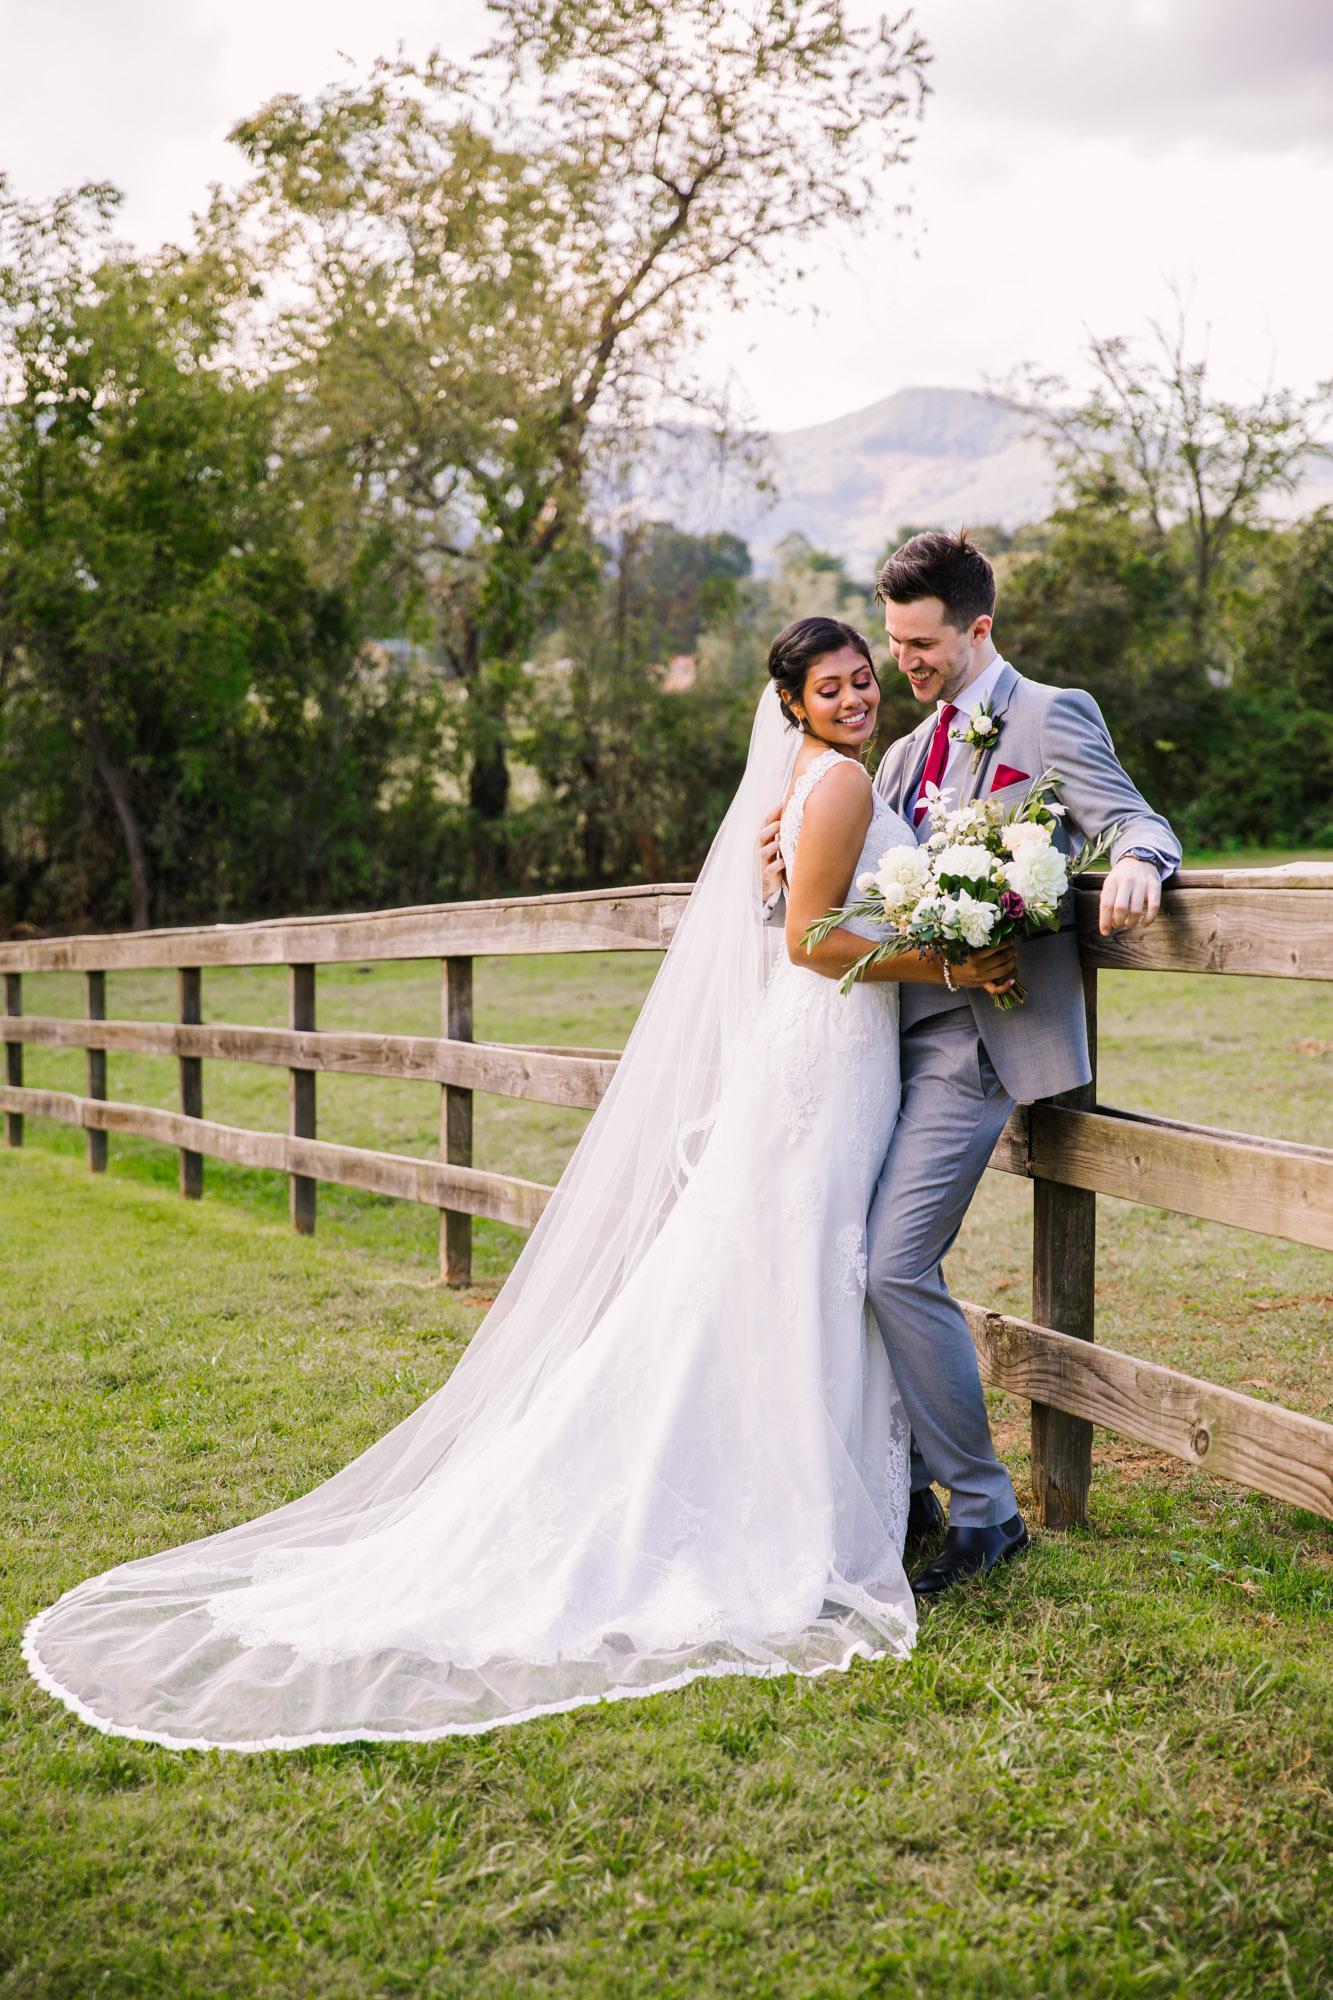 Waynesville NC Wedding Photography | Bride and Groom on the Farm